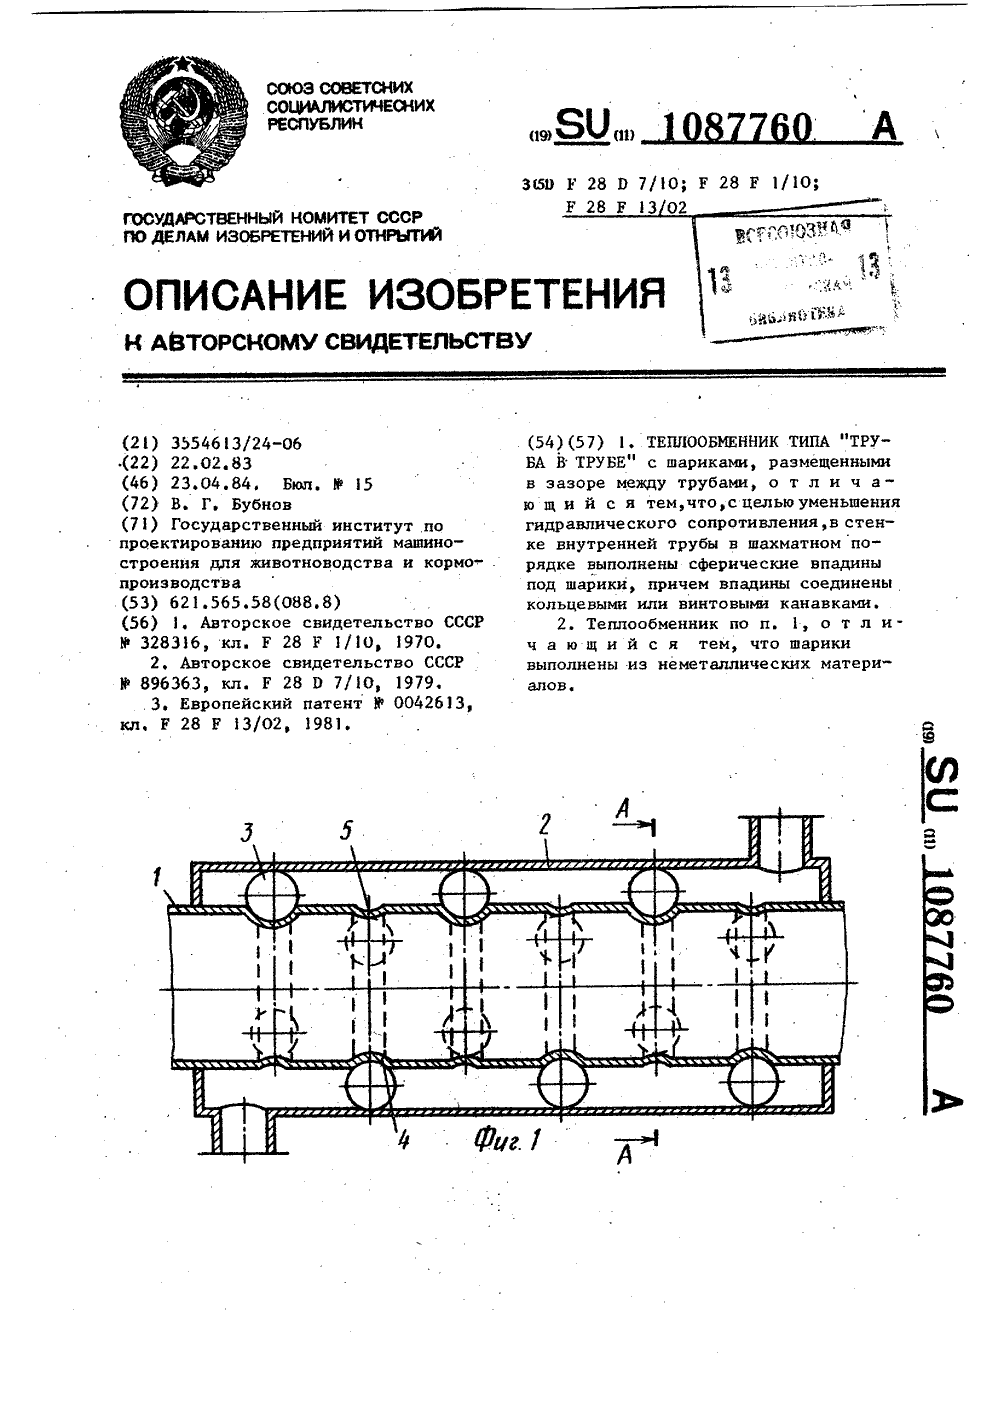 F теплообменник типа труба в трубе onda кожухотрубный теплообменник